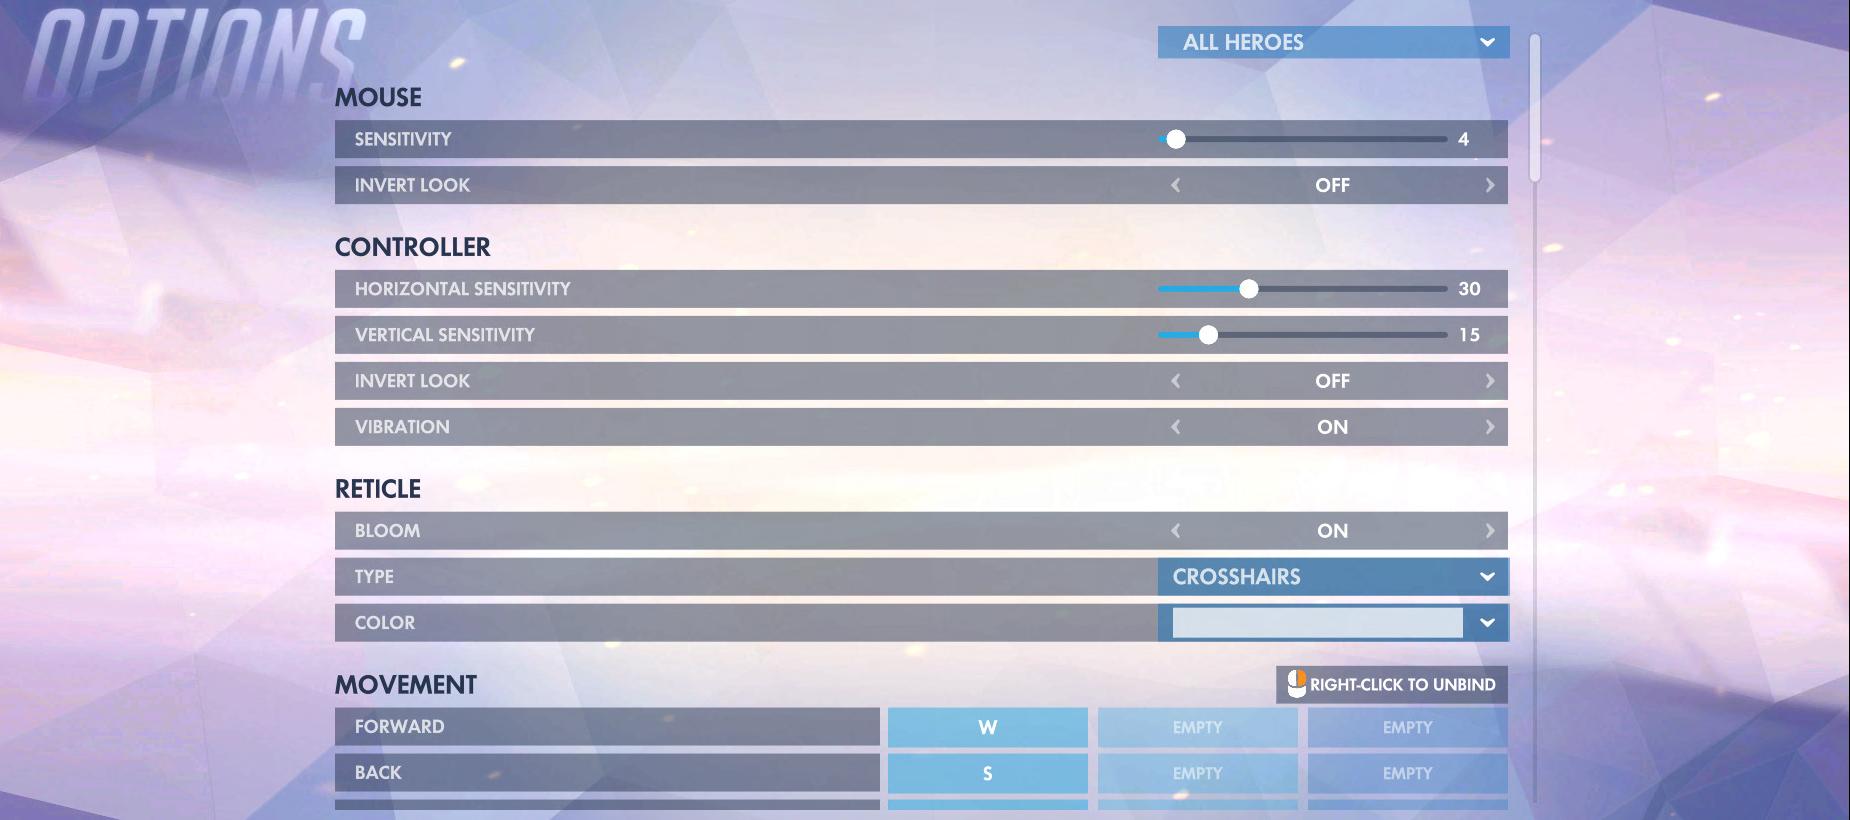 Overwatch Controls Options 1